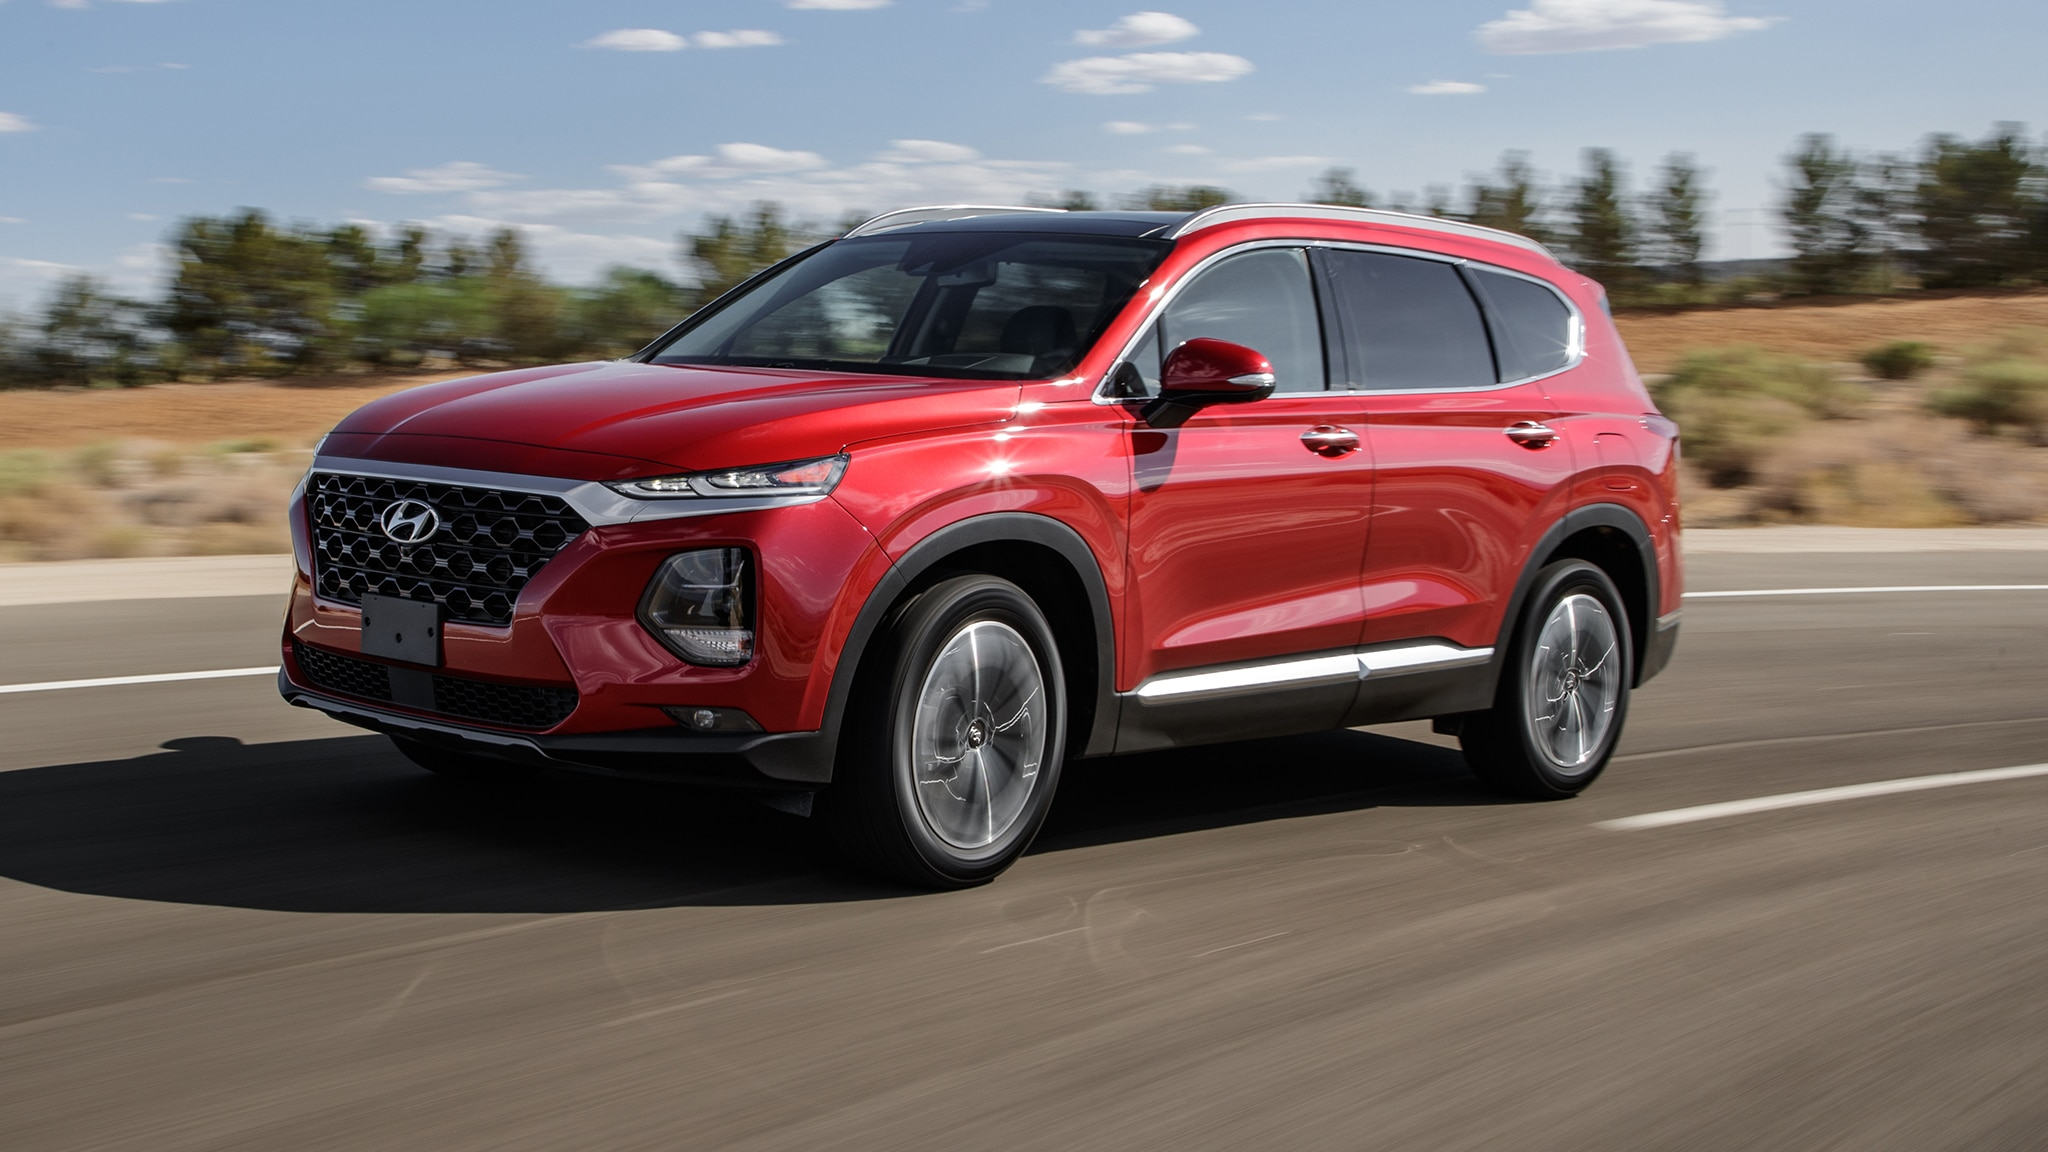 2019 Hyundai Santa Fe HTRAC Front Three Quarter In Motion 1